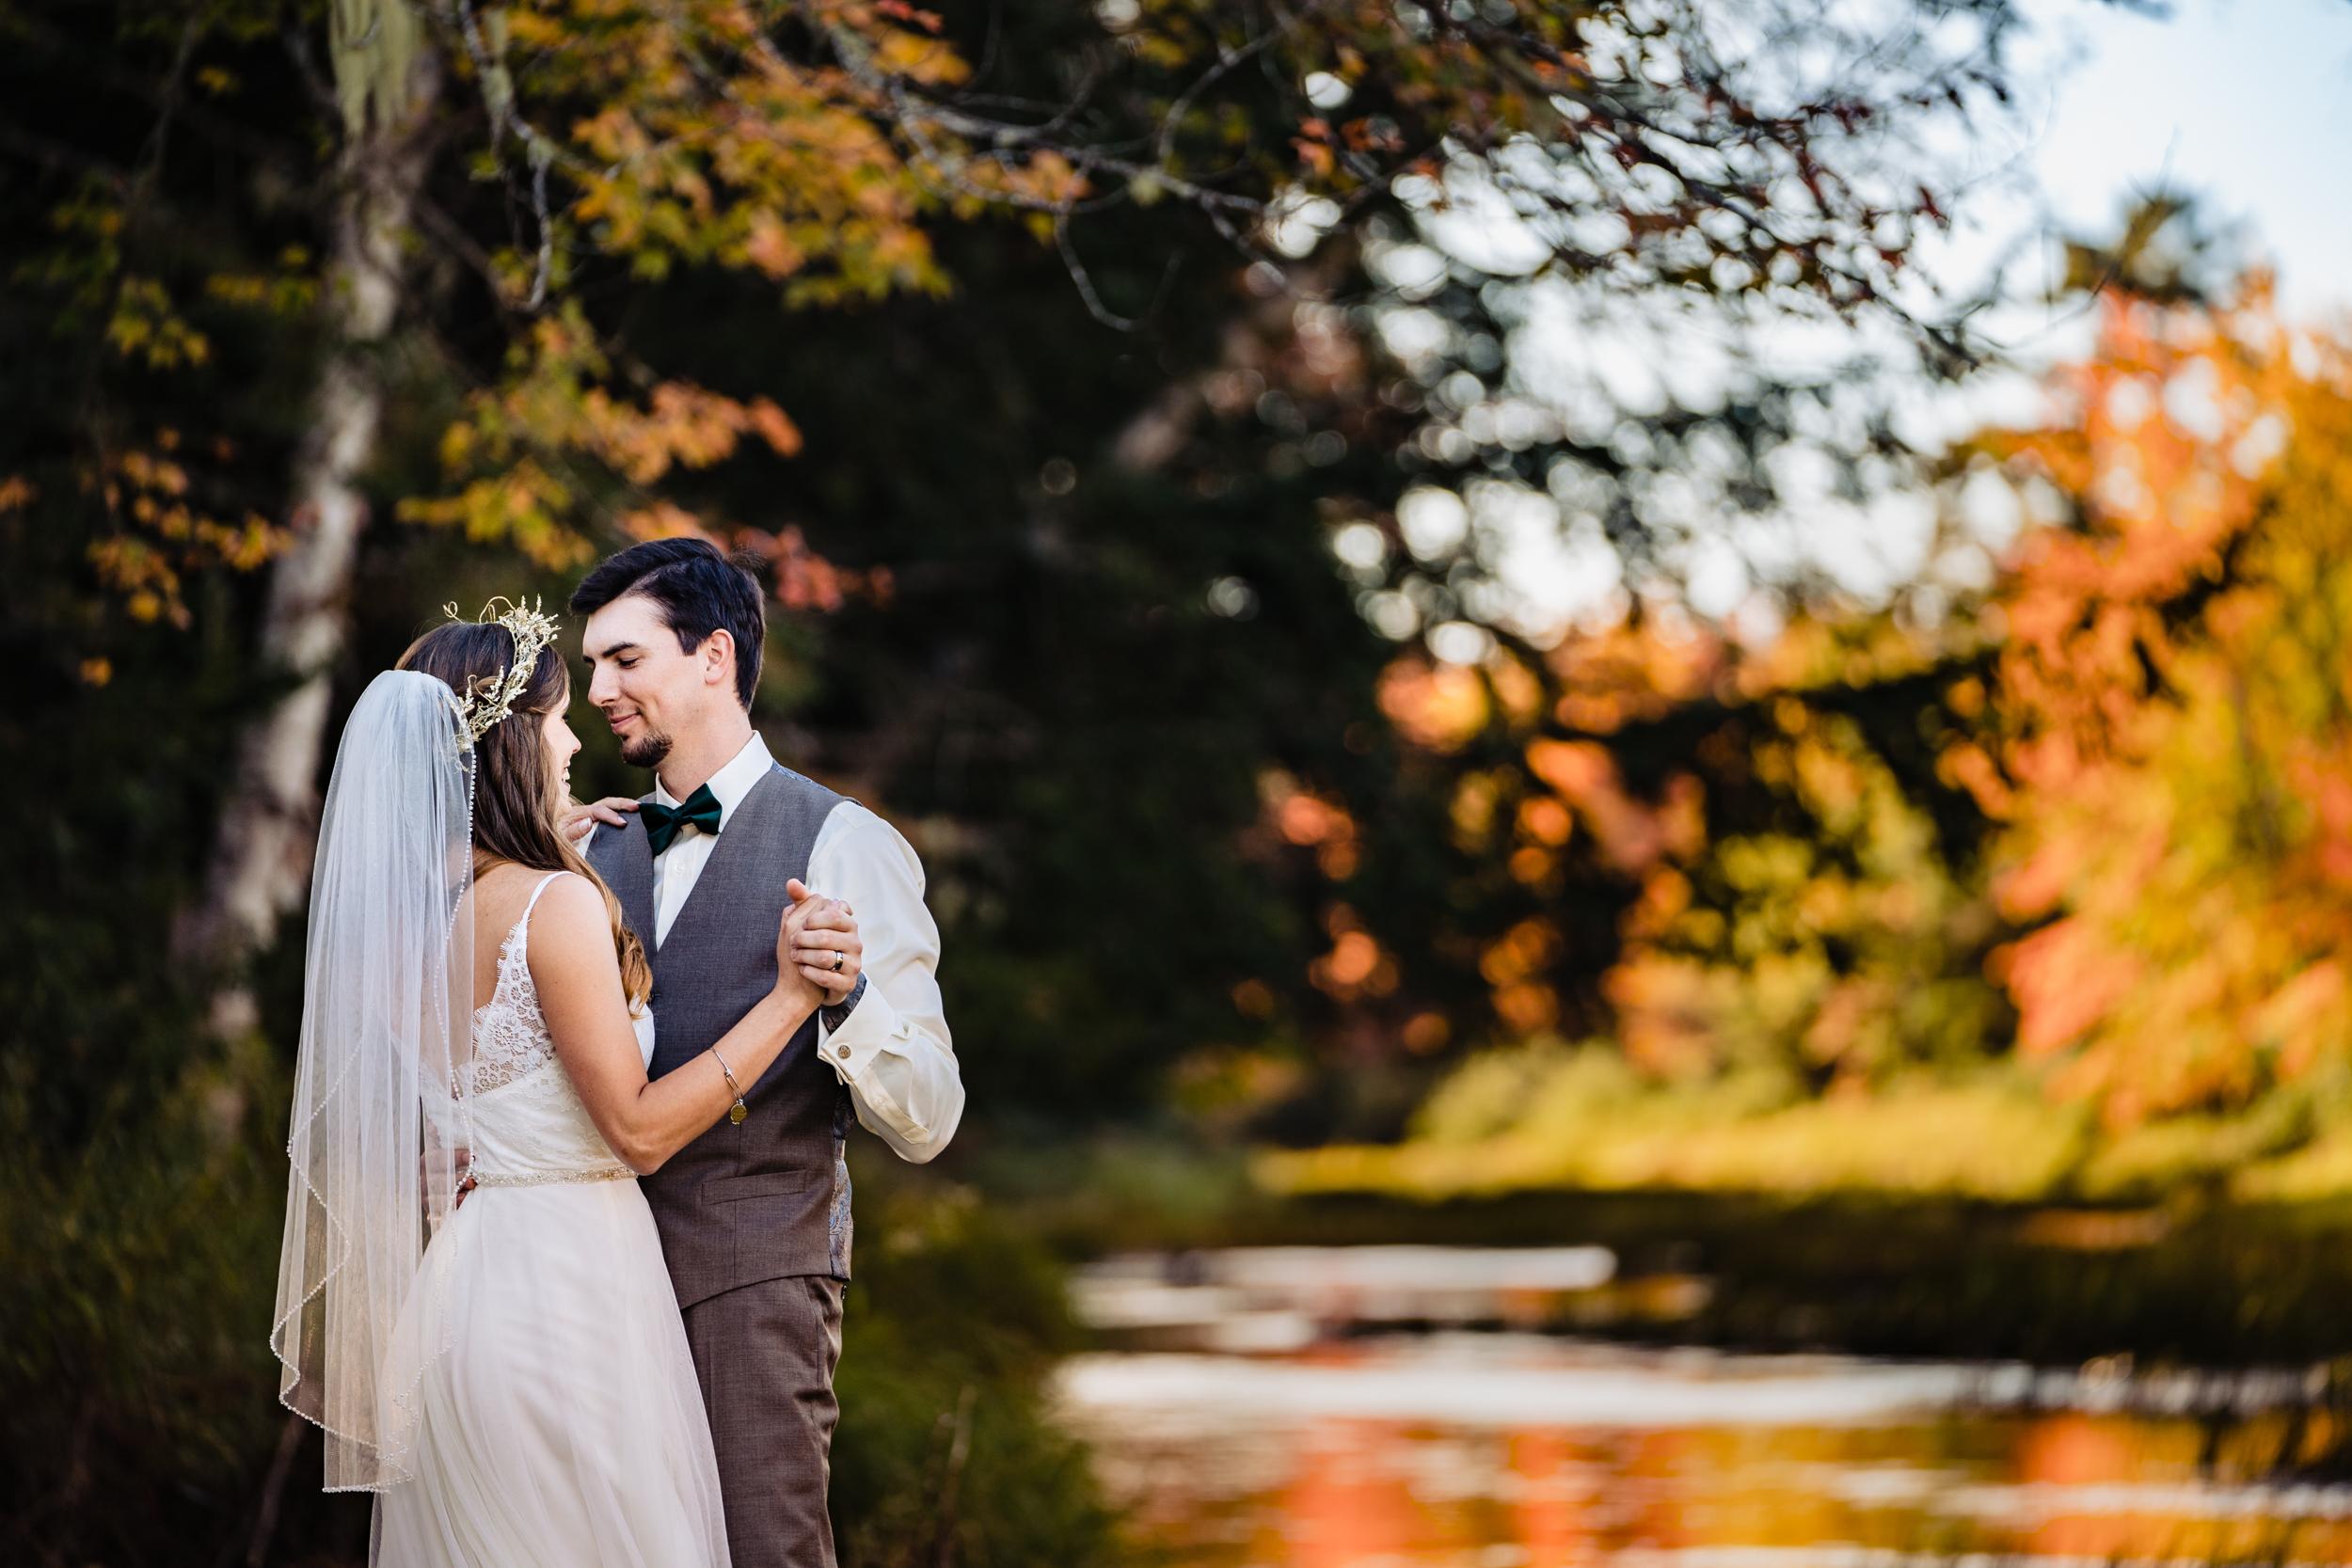 Halifax-wedding-photography-fall-photographers-novascotia-canada-ottawa (58 of 97).jpg